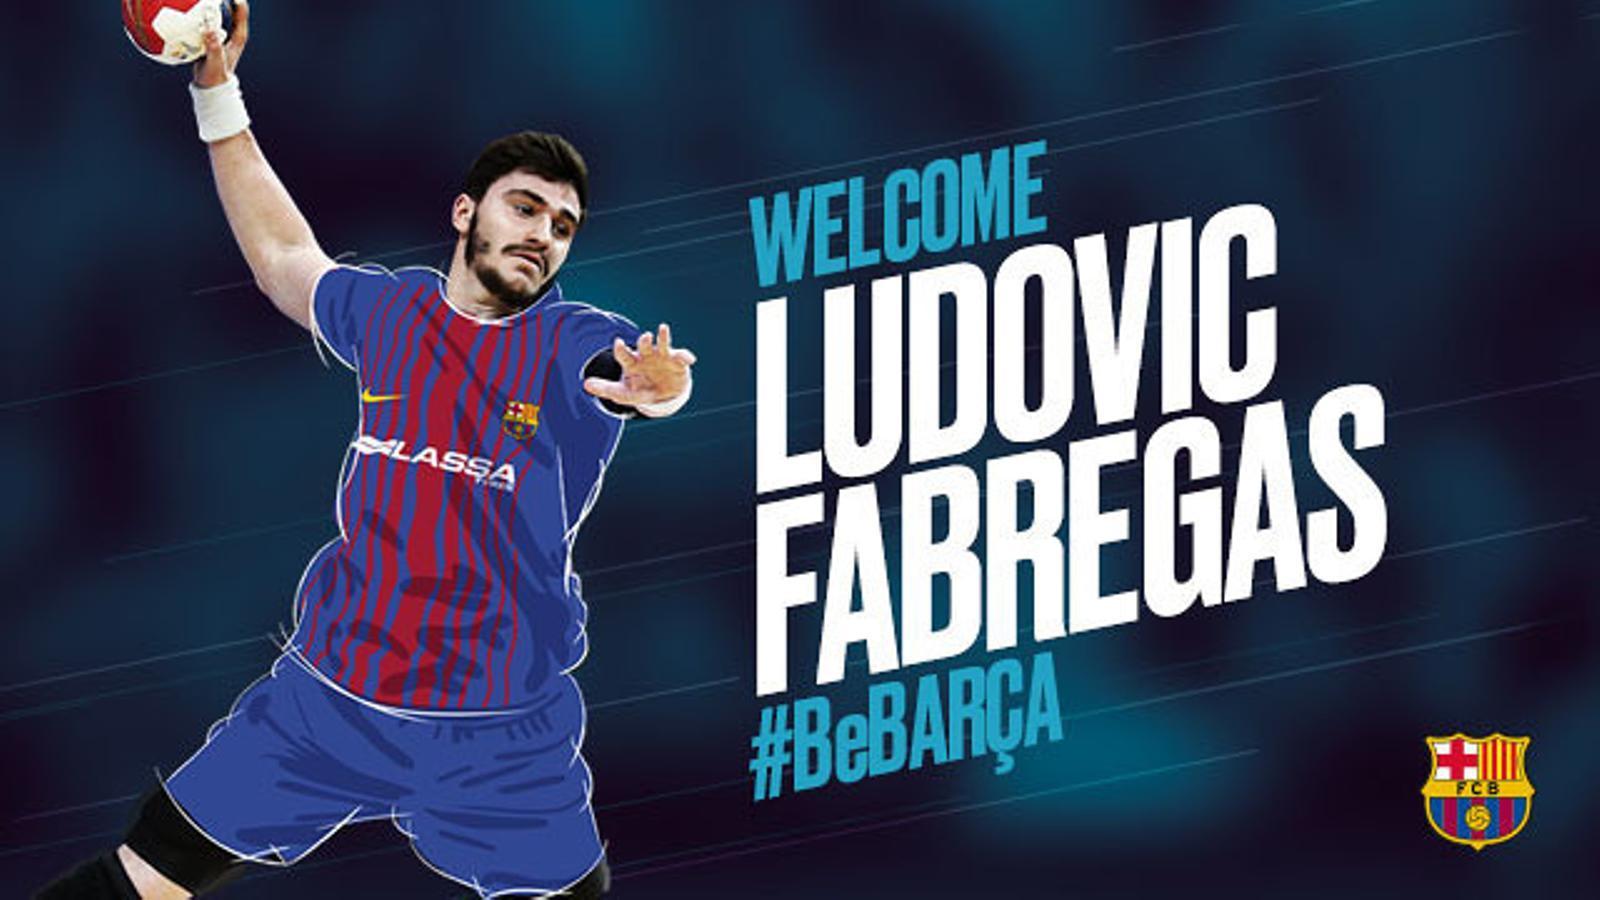 Ludovic Fàbregas reforça el Barça Lassa d'hanbdol